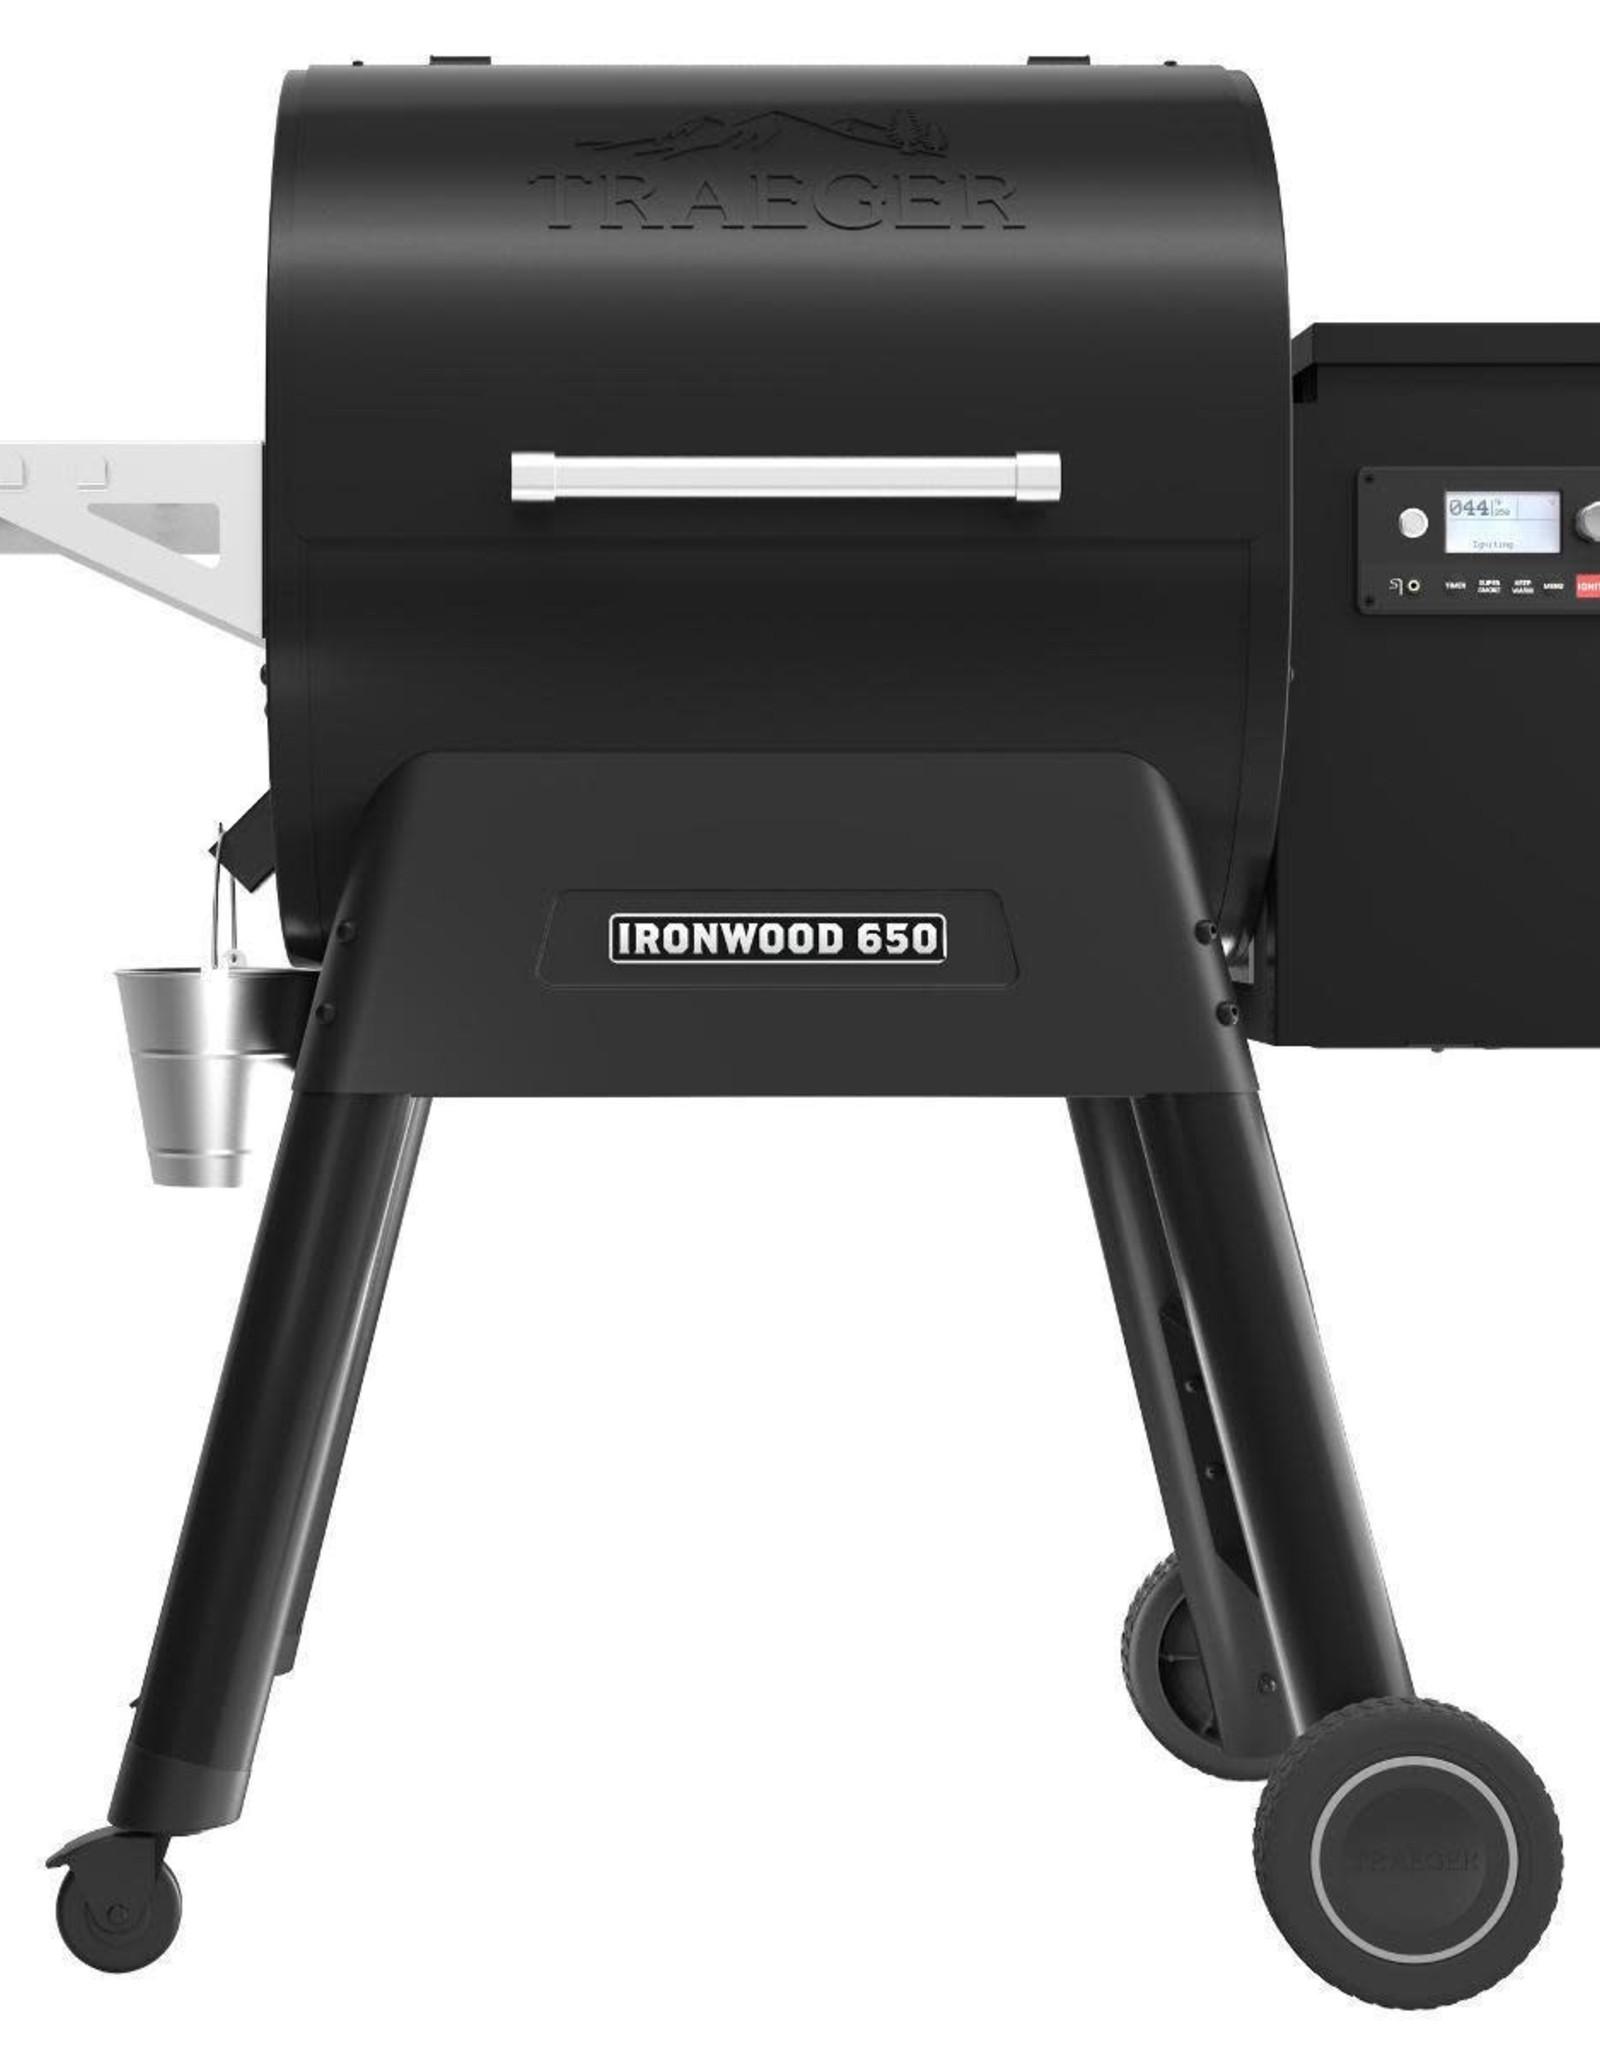 Traeger Traeger Ironwood 650 with WiFIRE Technology D2 Wood Pellet Freestanding Smoker Black TFB65BLF